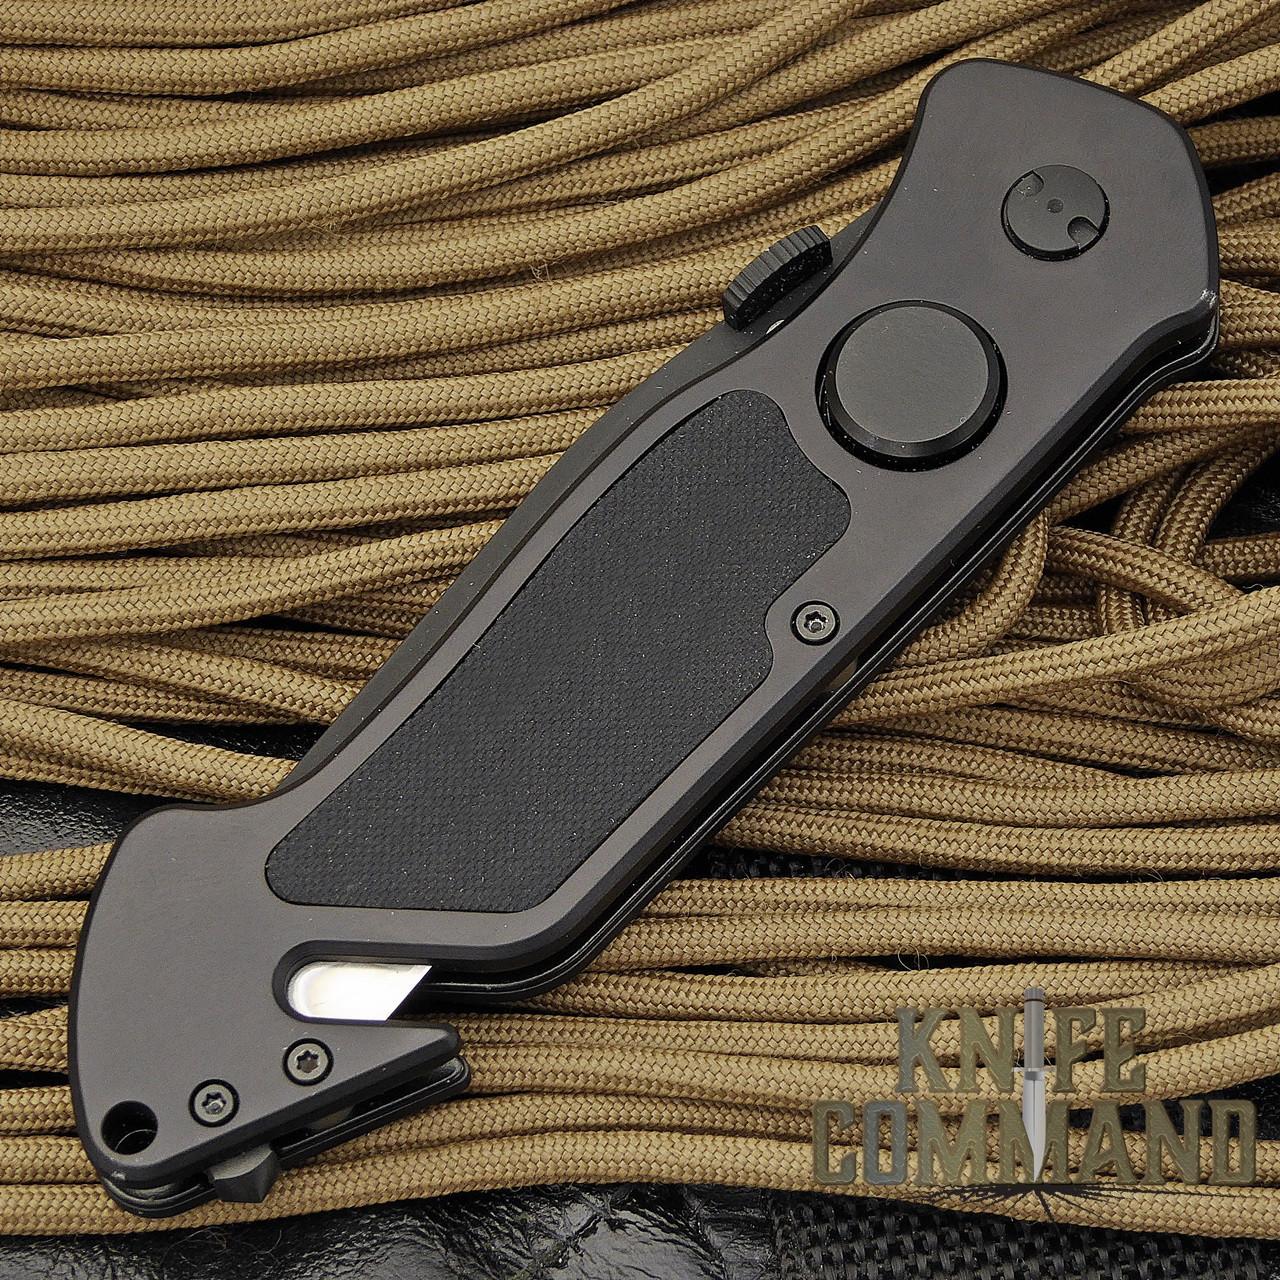 Eickhorn Solingen PRT VI Black Tactical Emergency Rescue Knife.  Thumb stud and lock release big enough, even when wearing gloves.